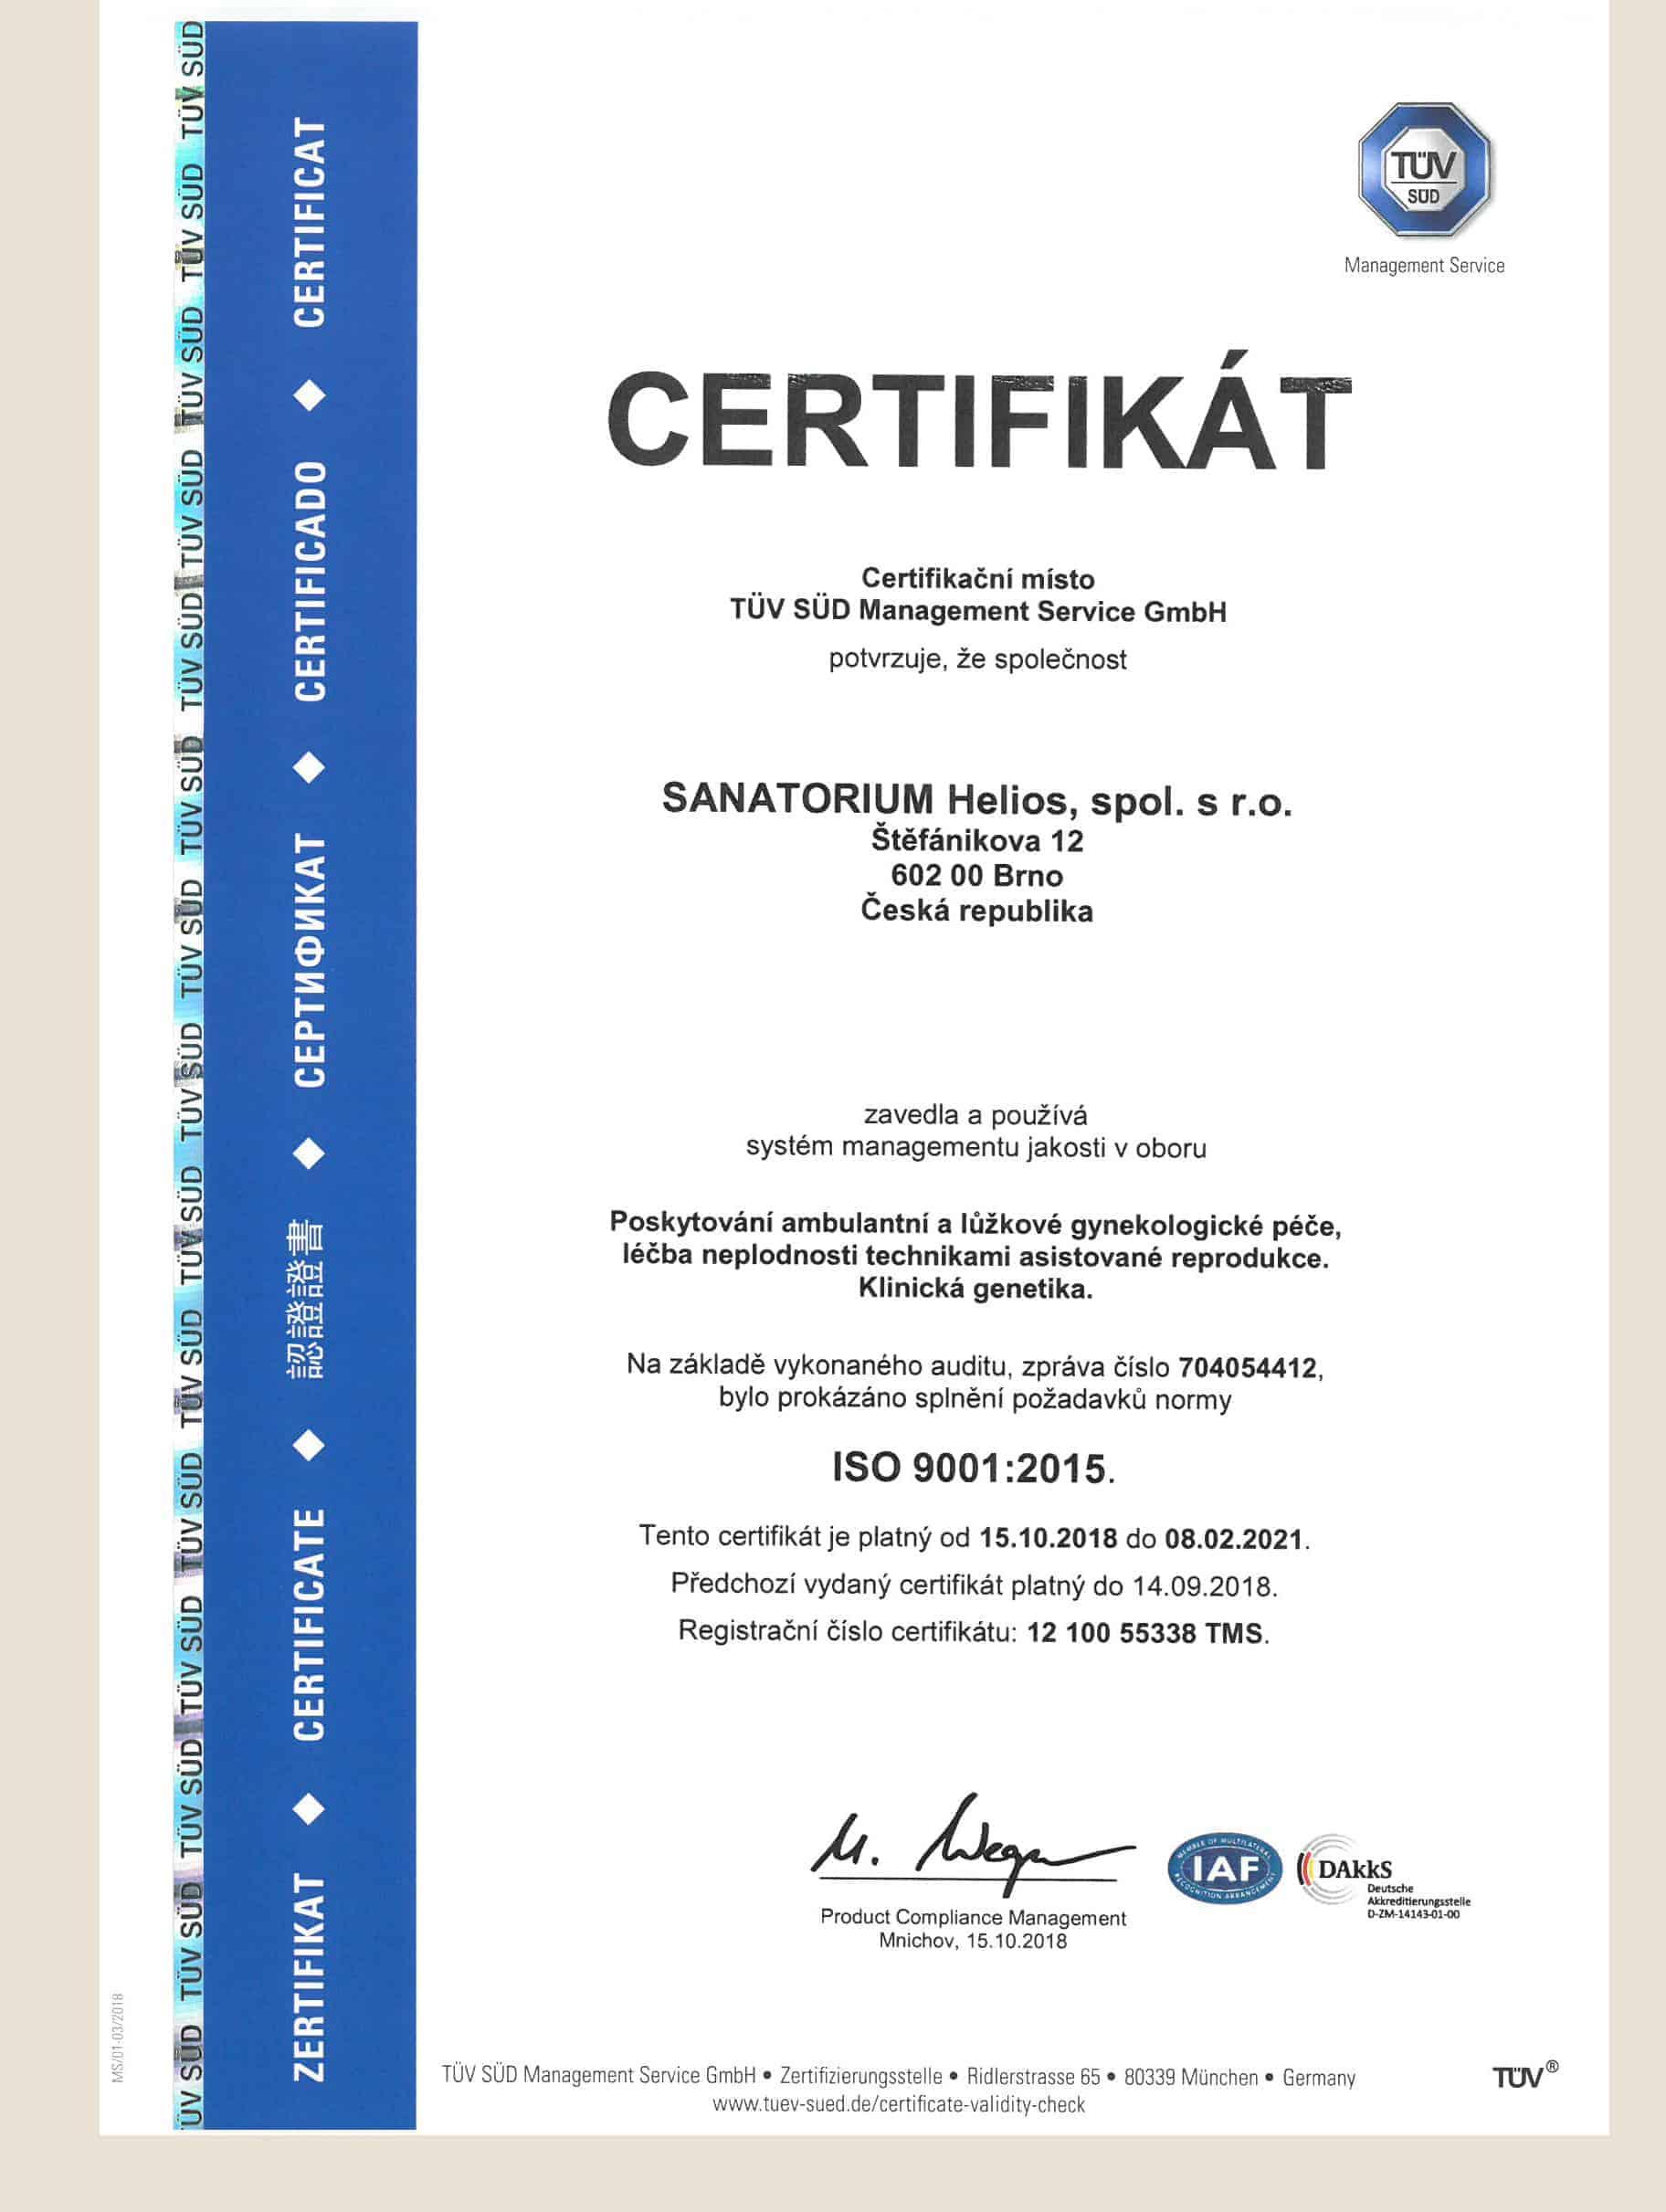 sanatorium helios acreditation